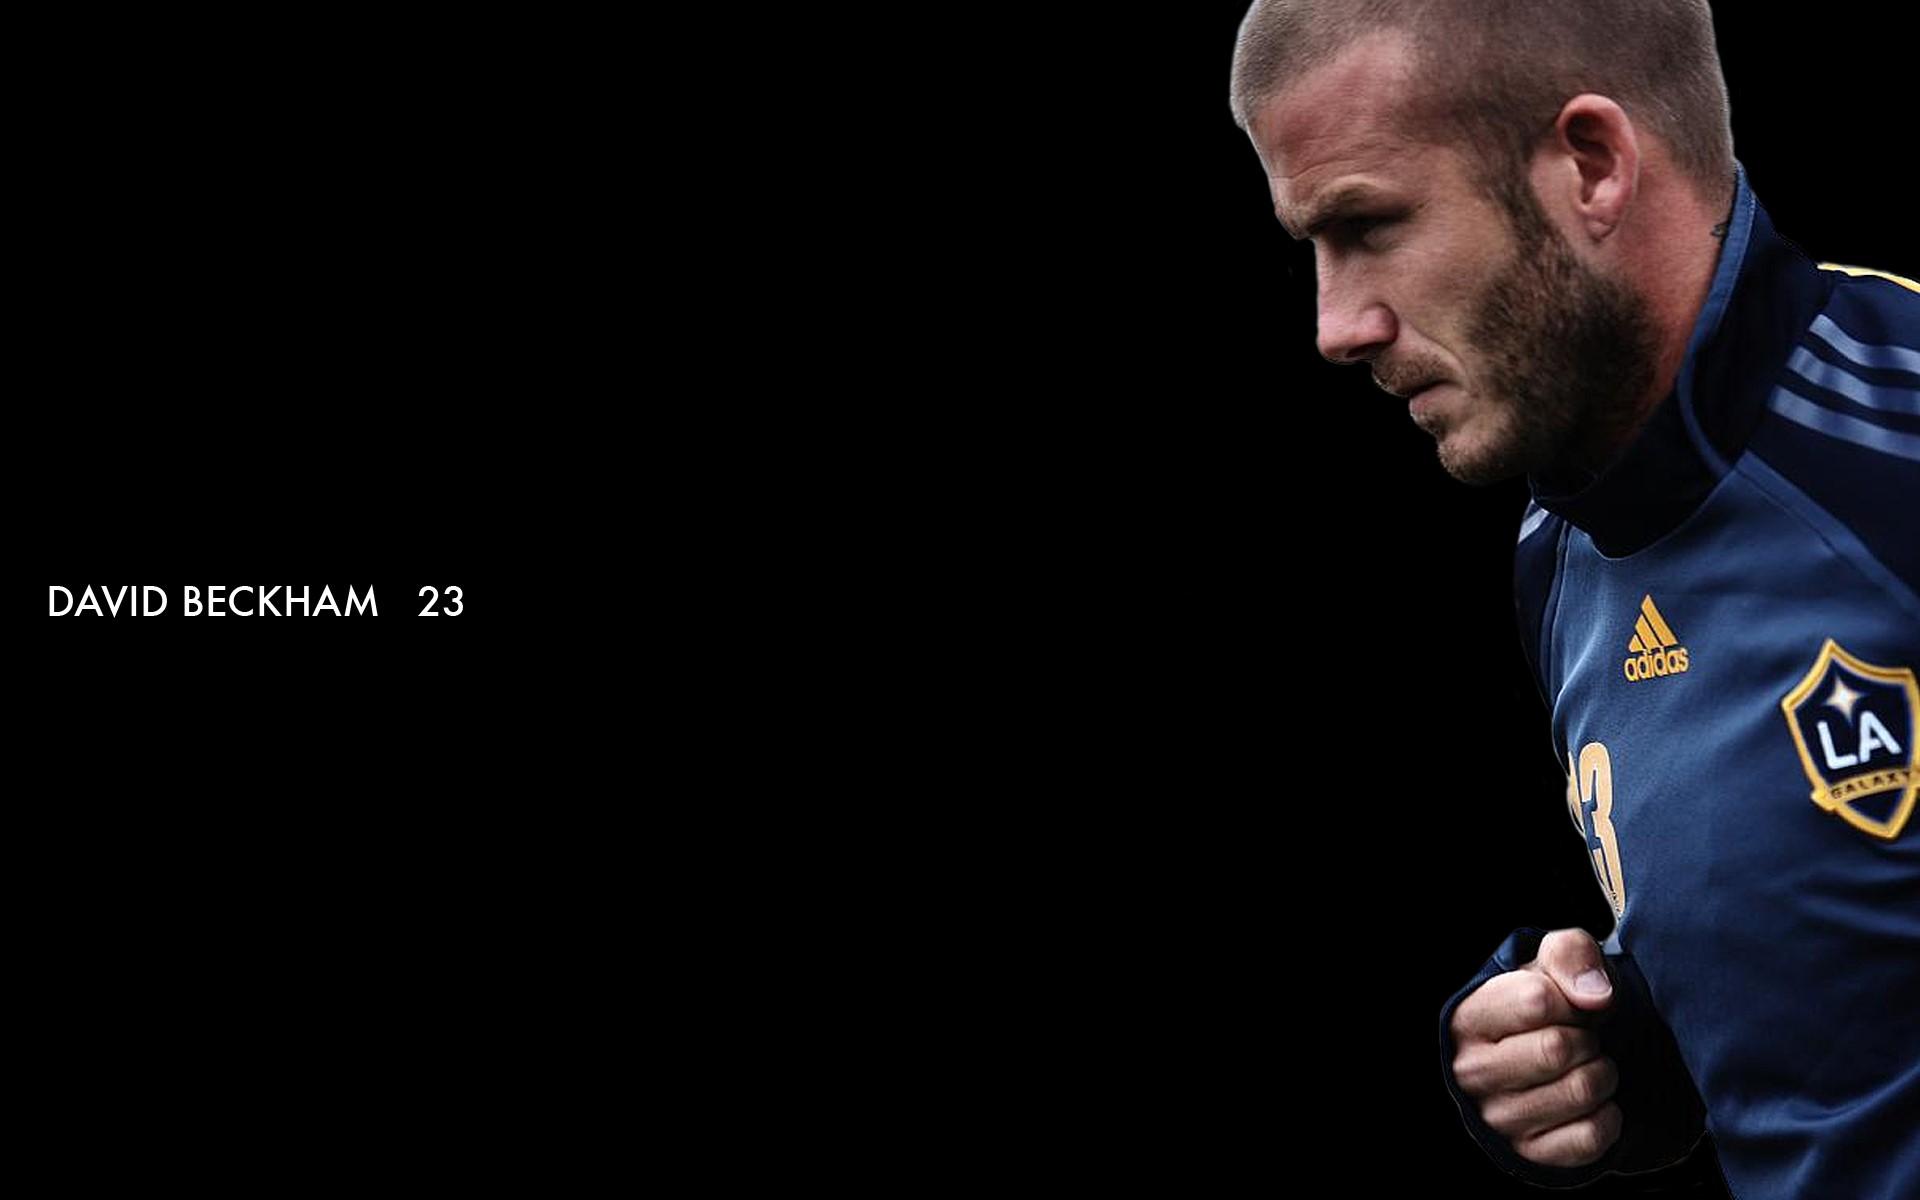 David Beckham Background images